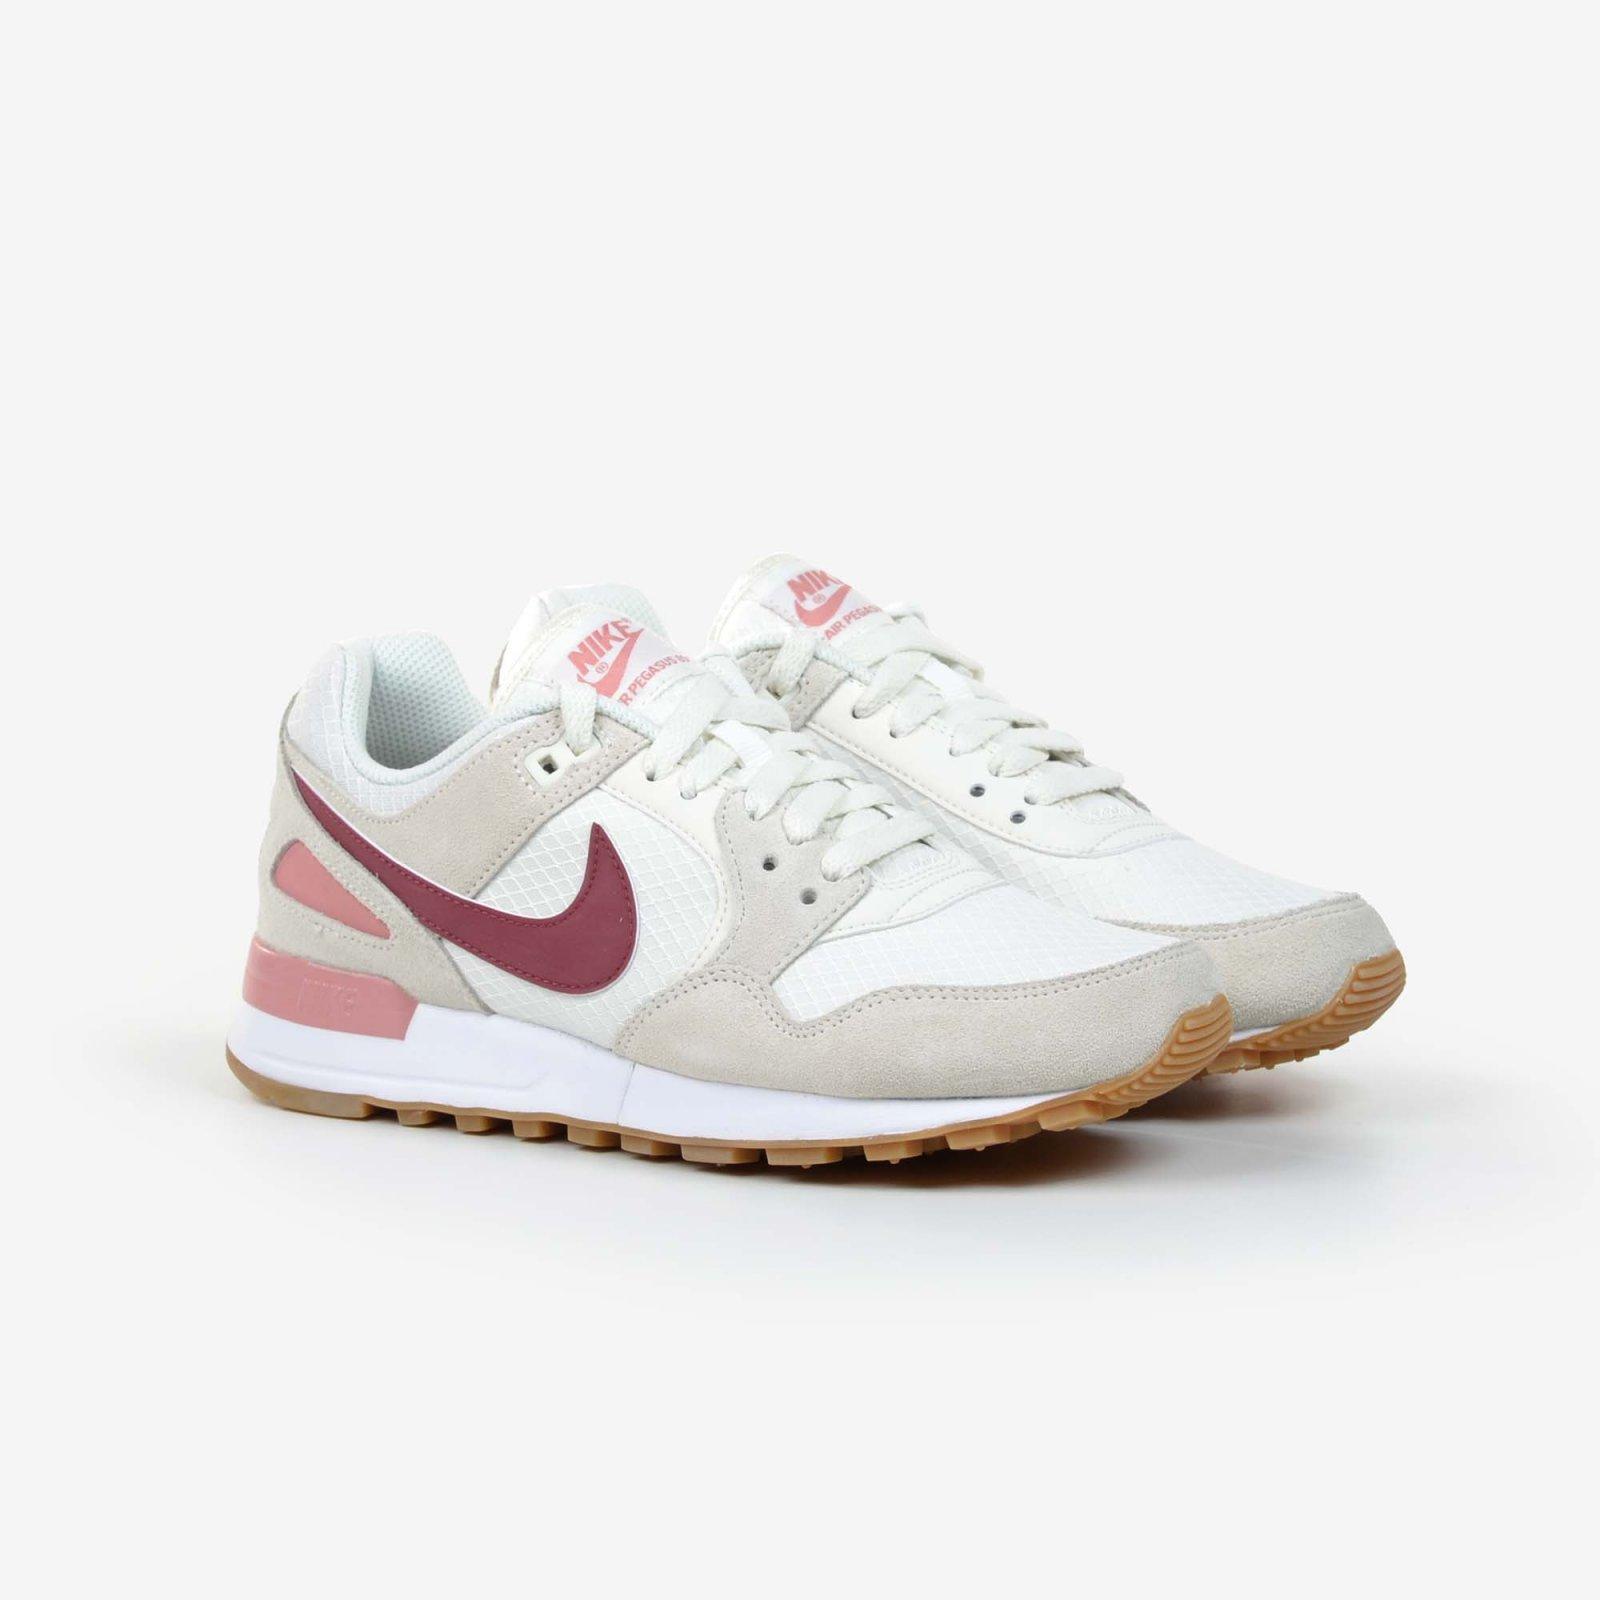 best service 6733e b6233 Nike Women s Air Pegasus 89 Vintage Sail Red Suede Running Shoes NIB ...